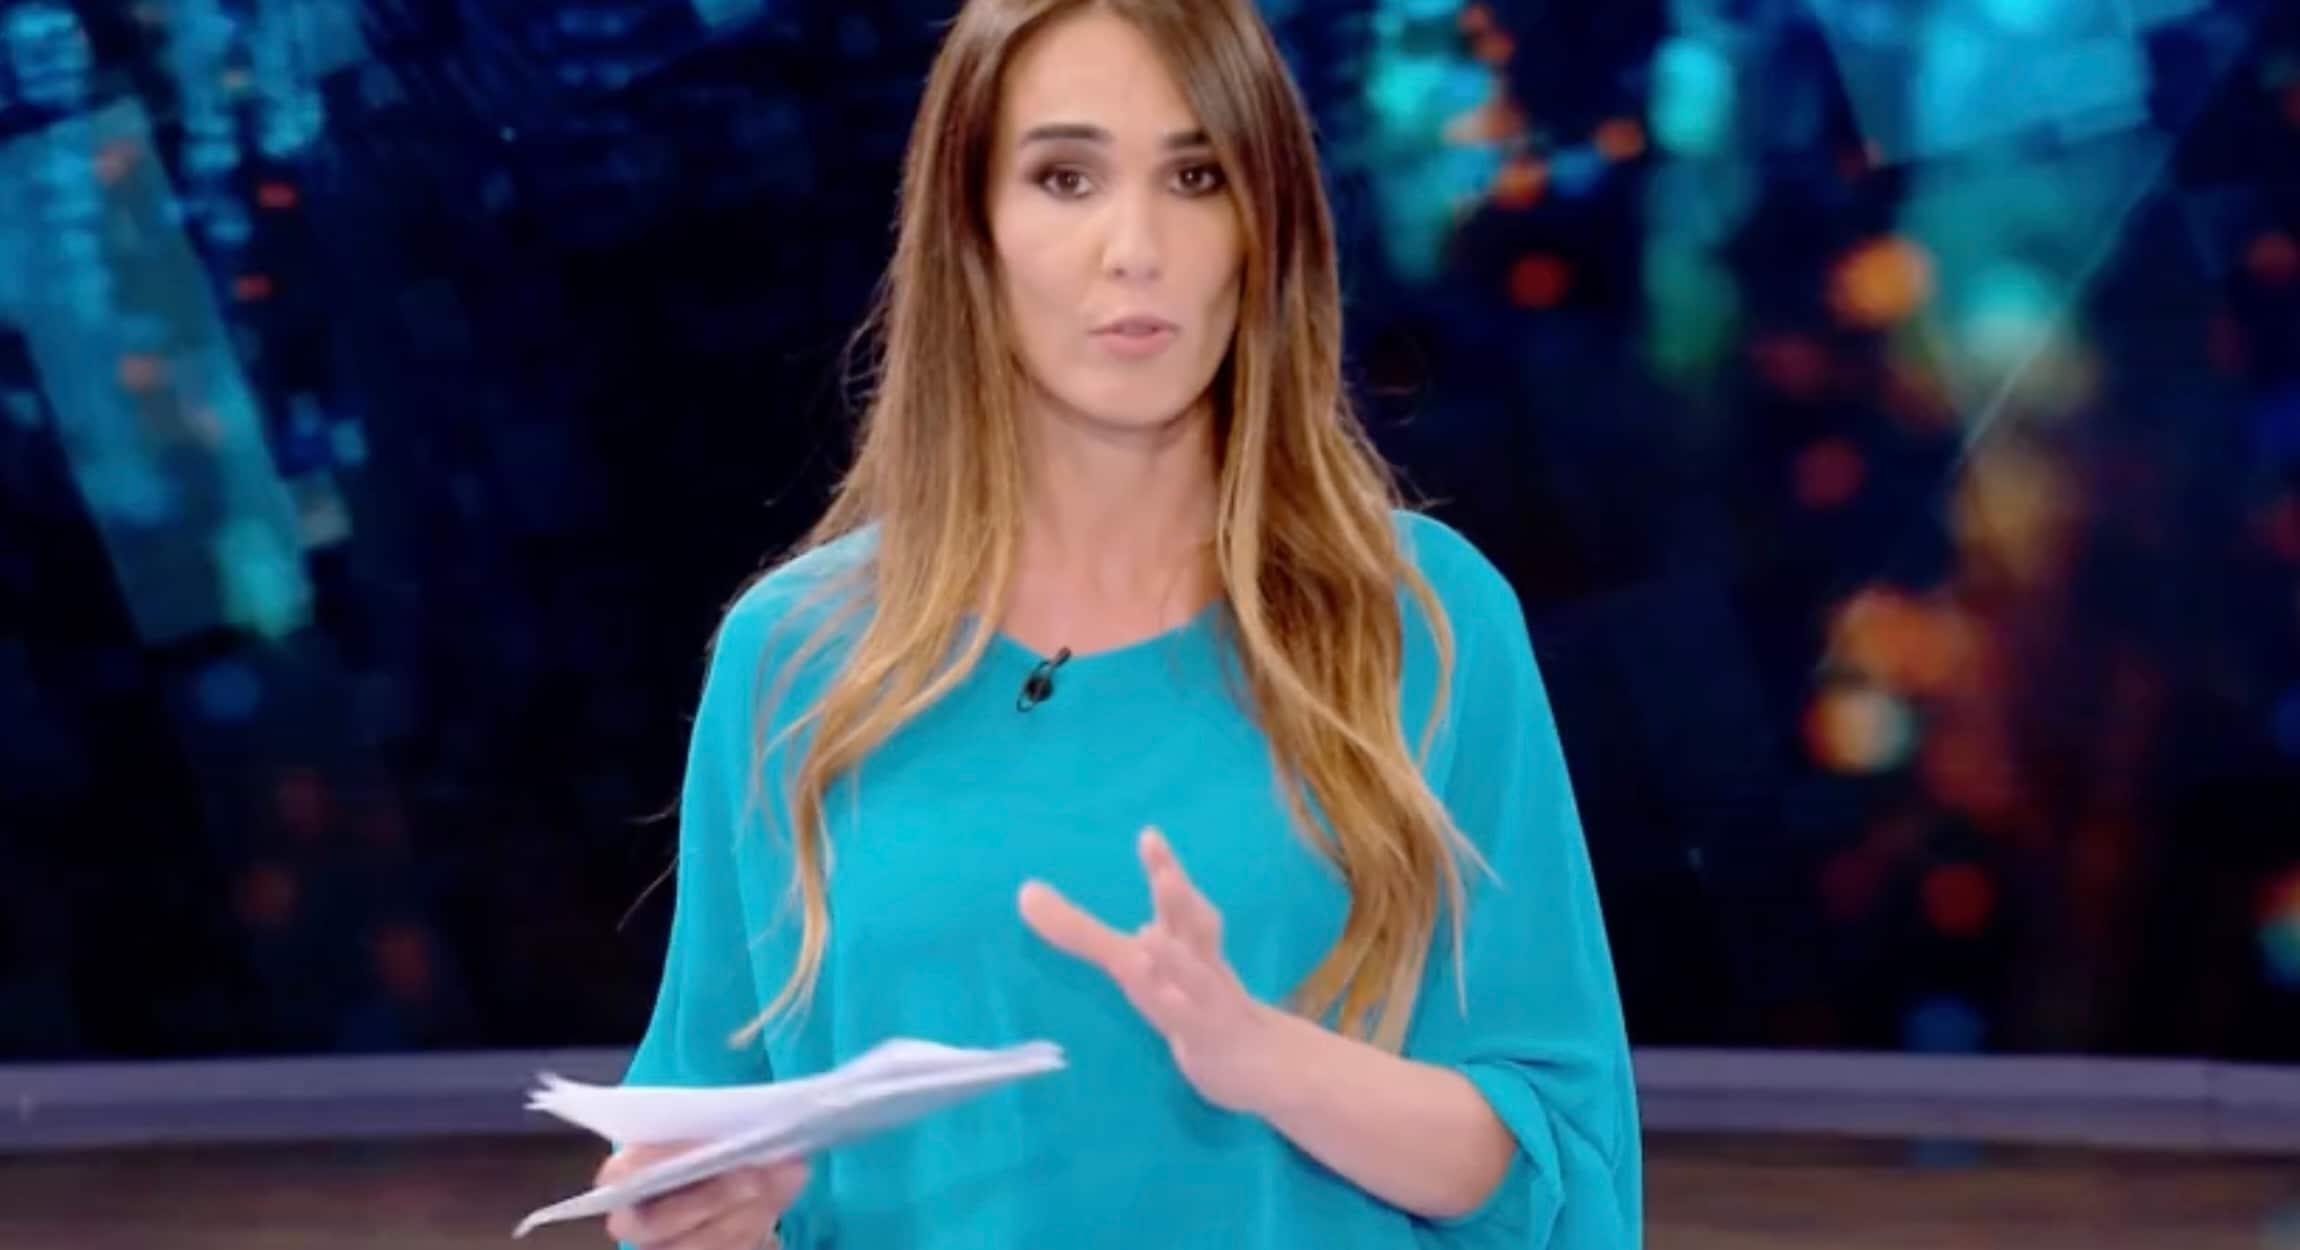 Silvia Toffanin Verissimo